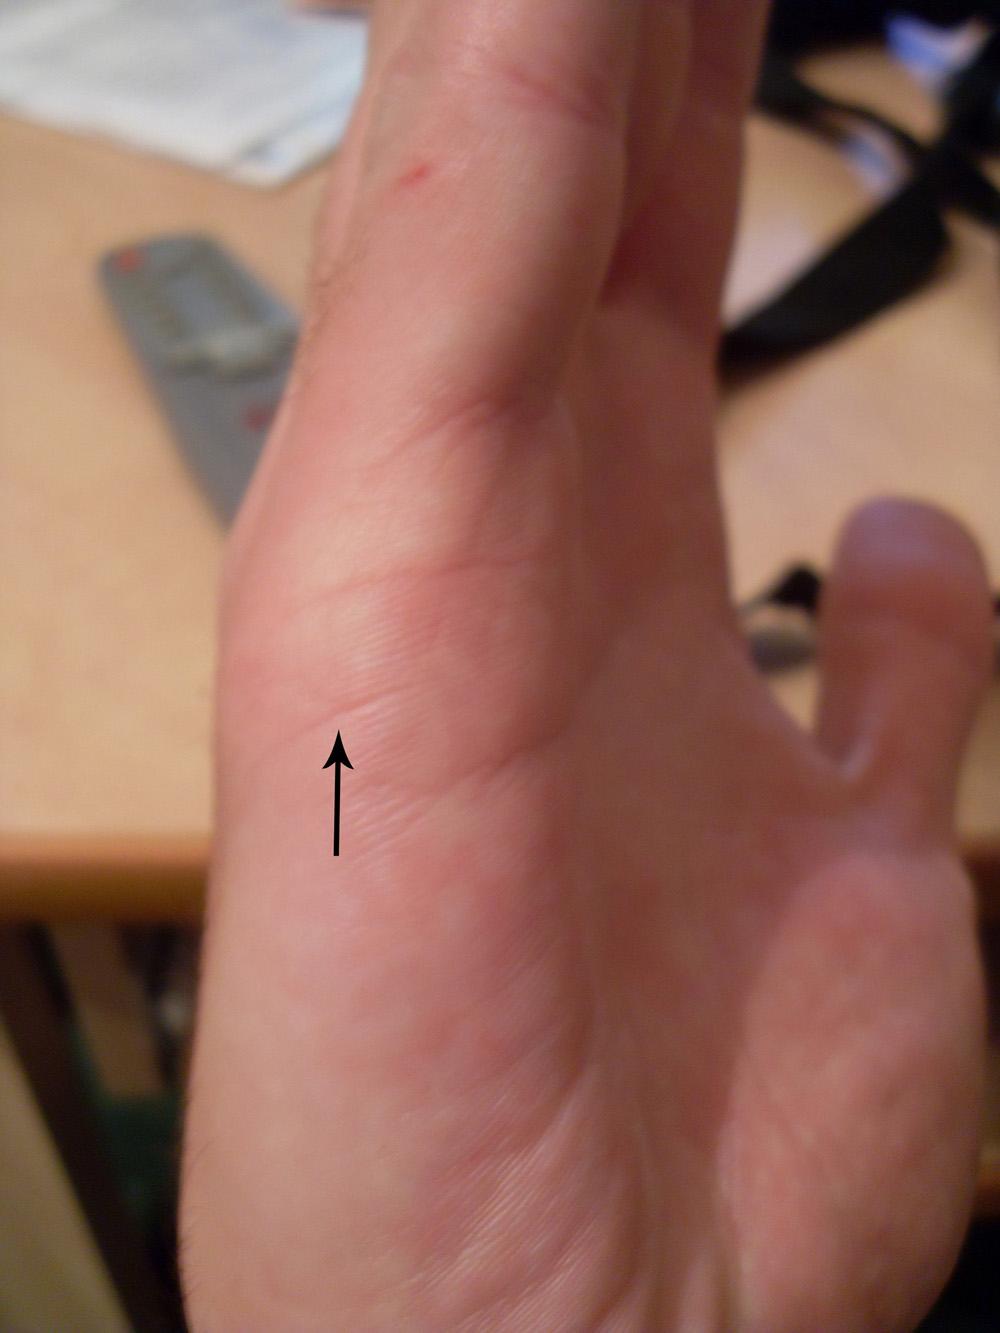 аллергия на правой руке психосоматика